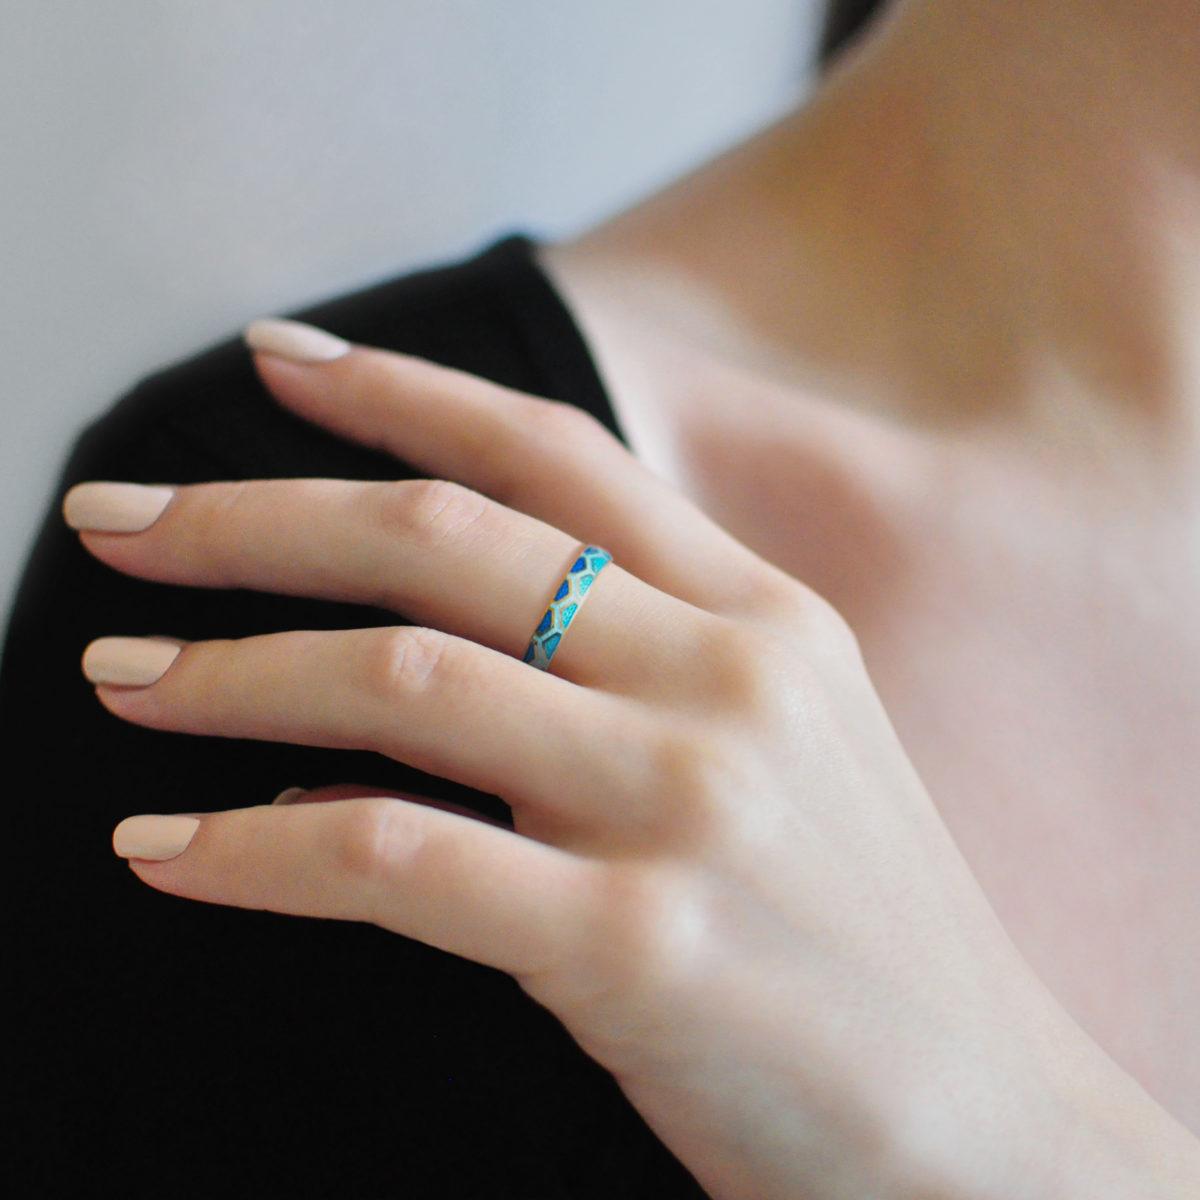 Zolochenie sine golubaya 1 1200x1200 - Кольцо серебряное «Седмица» (золочение), голубое